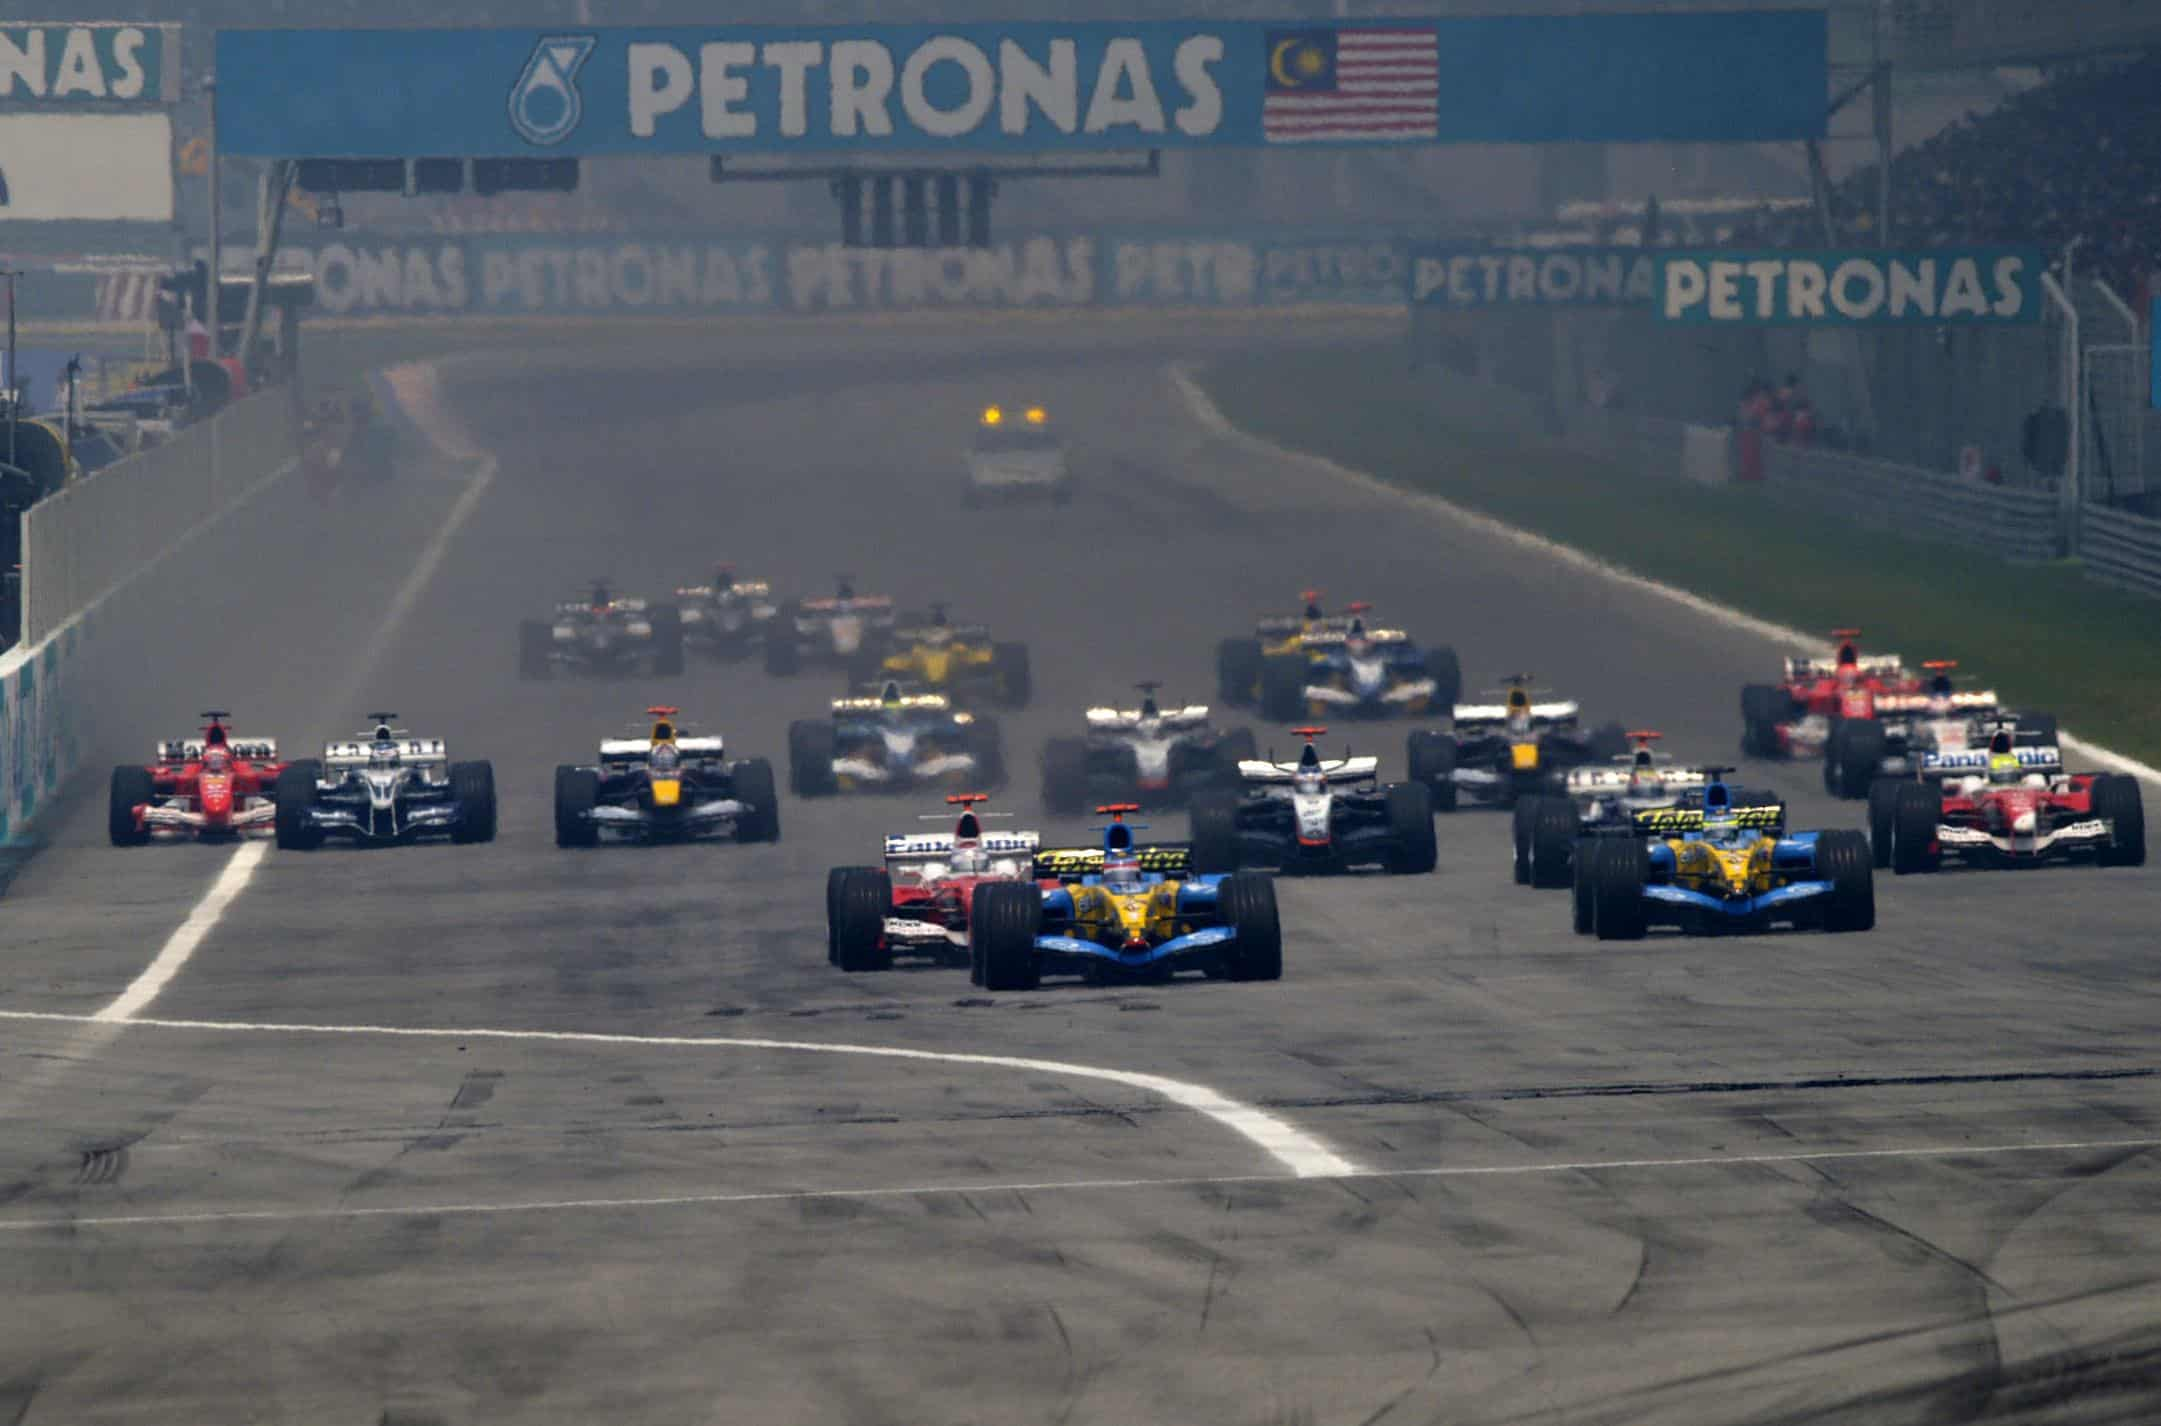 2005-Malaysian-GP-F1-start-Fernando-Alonso-leads-Jarno-Trulli-Photo-Ferrari